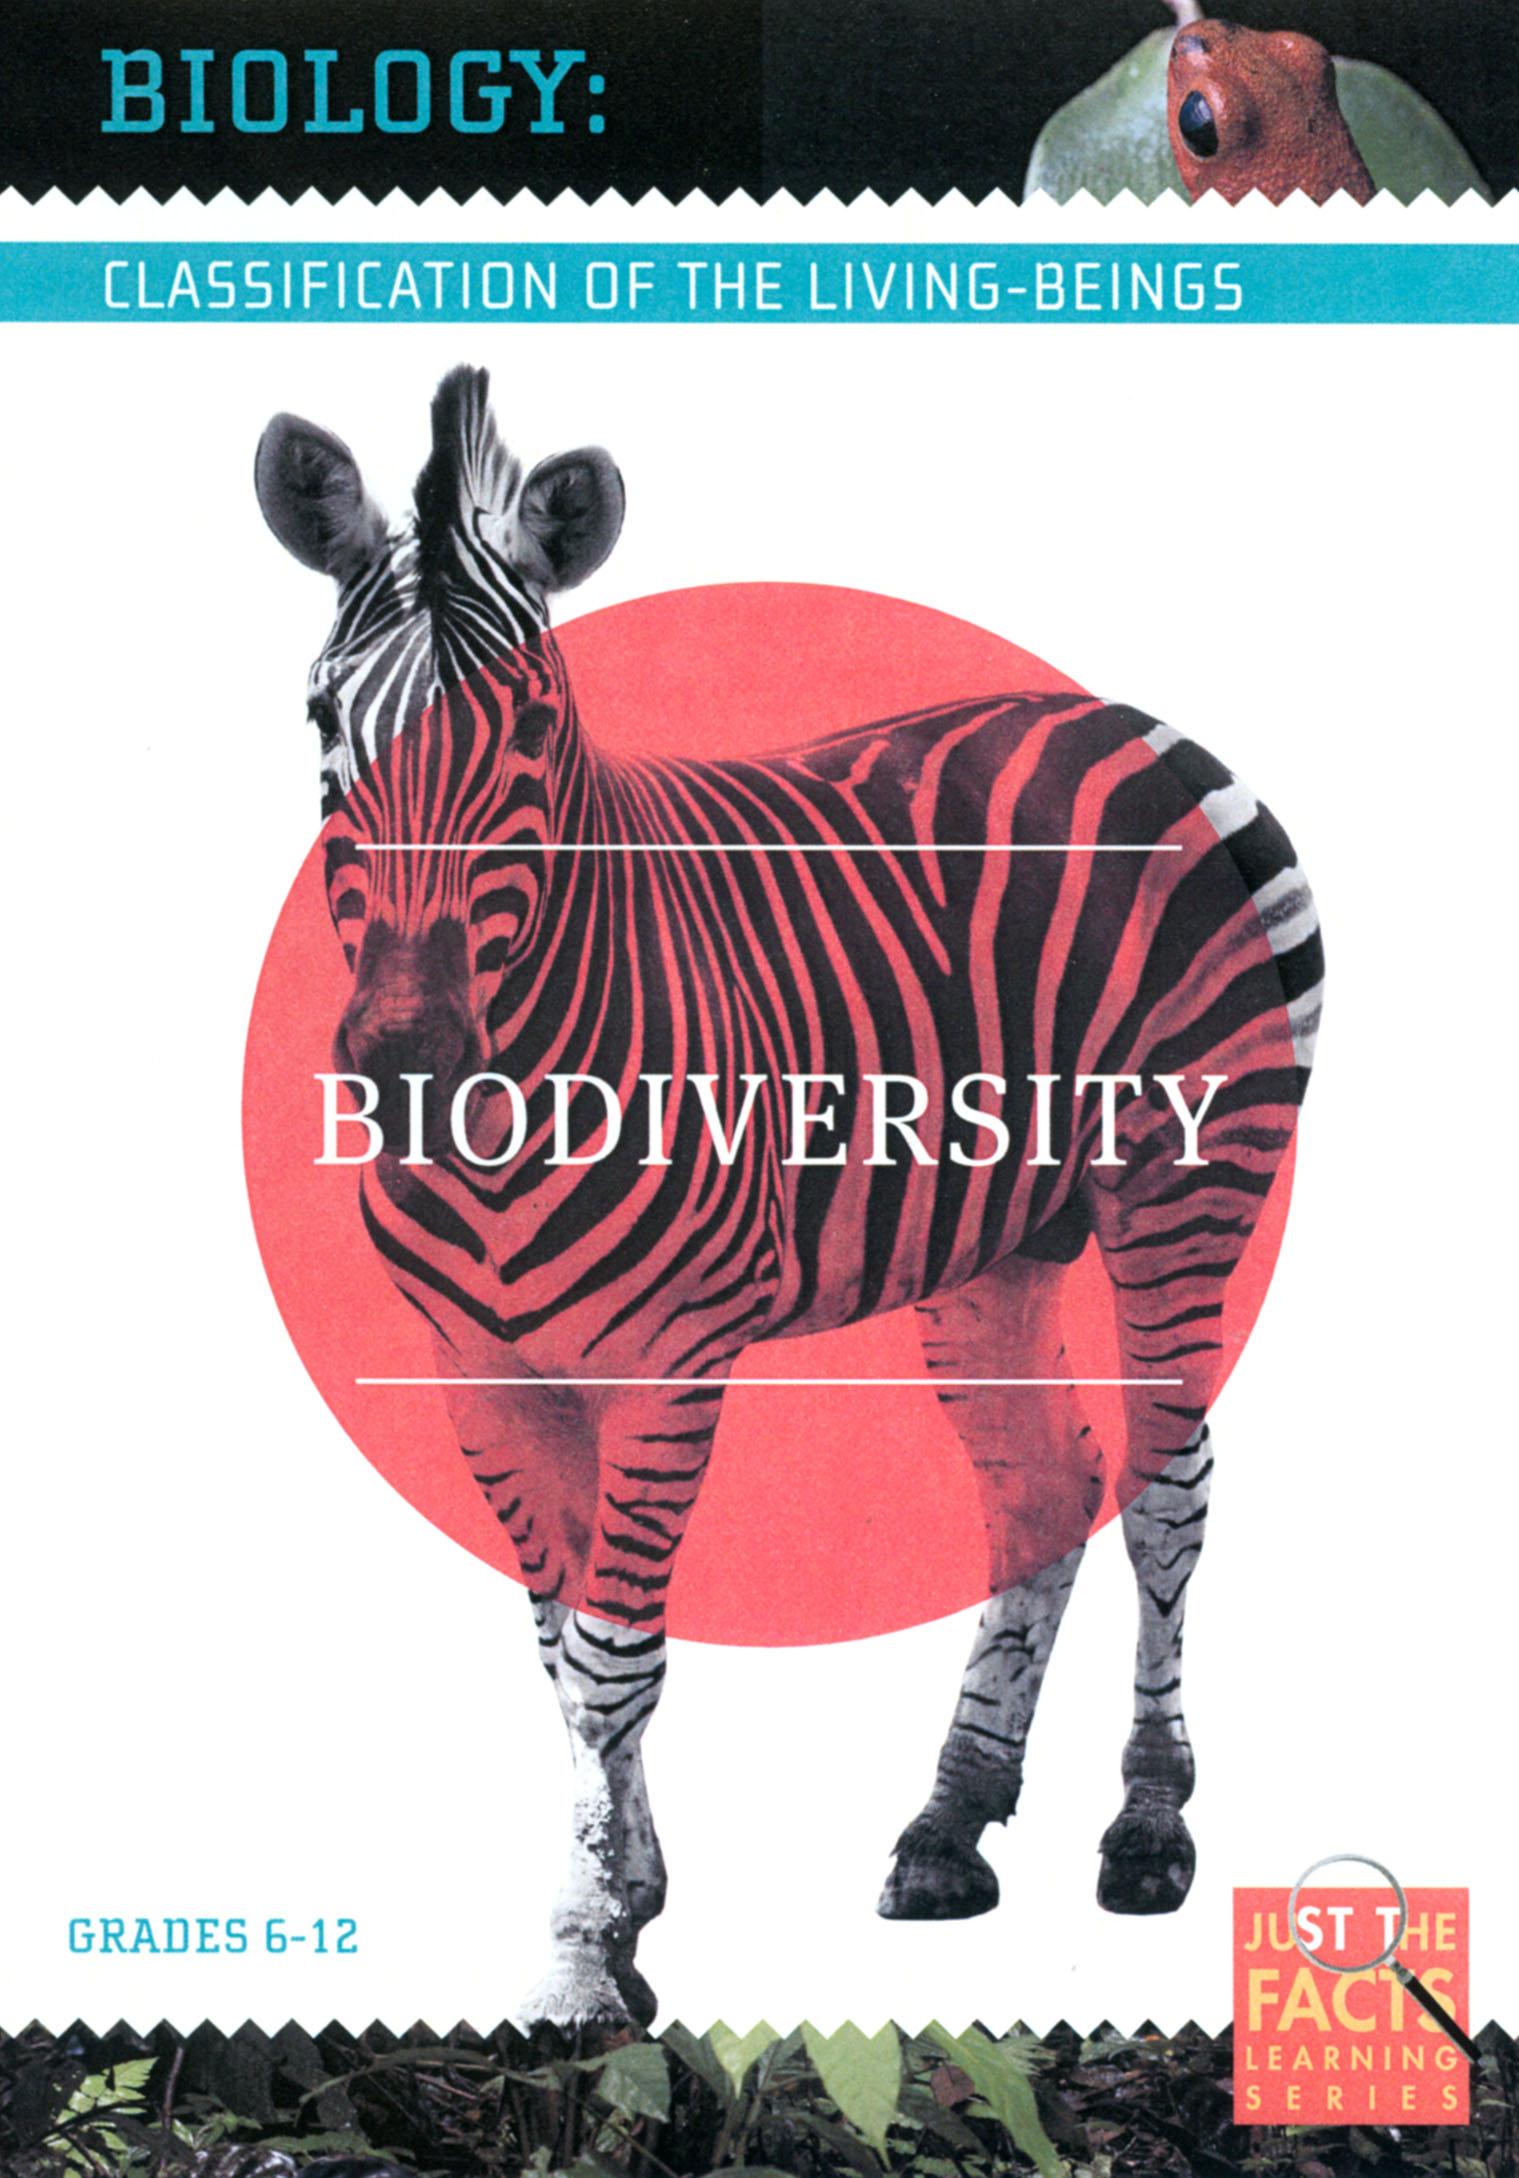 Biology Classification: Biodiversity